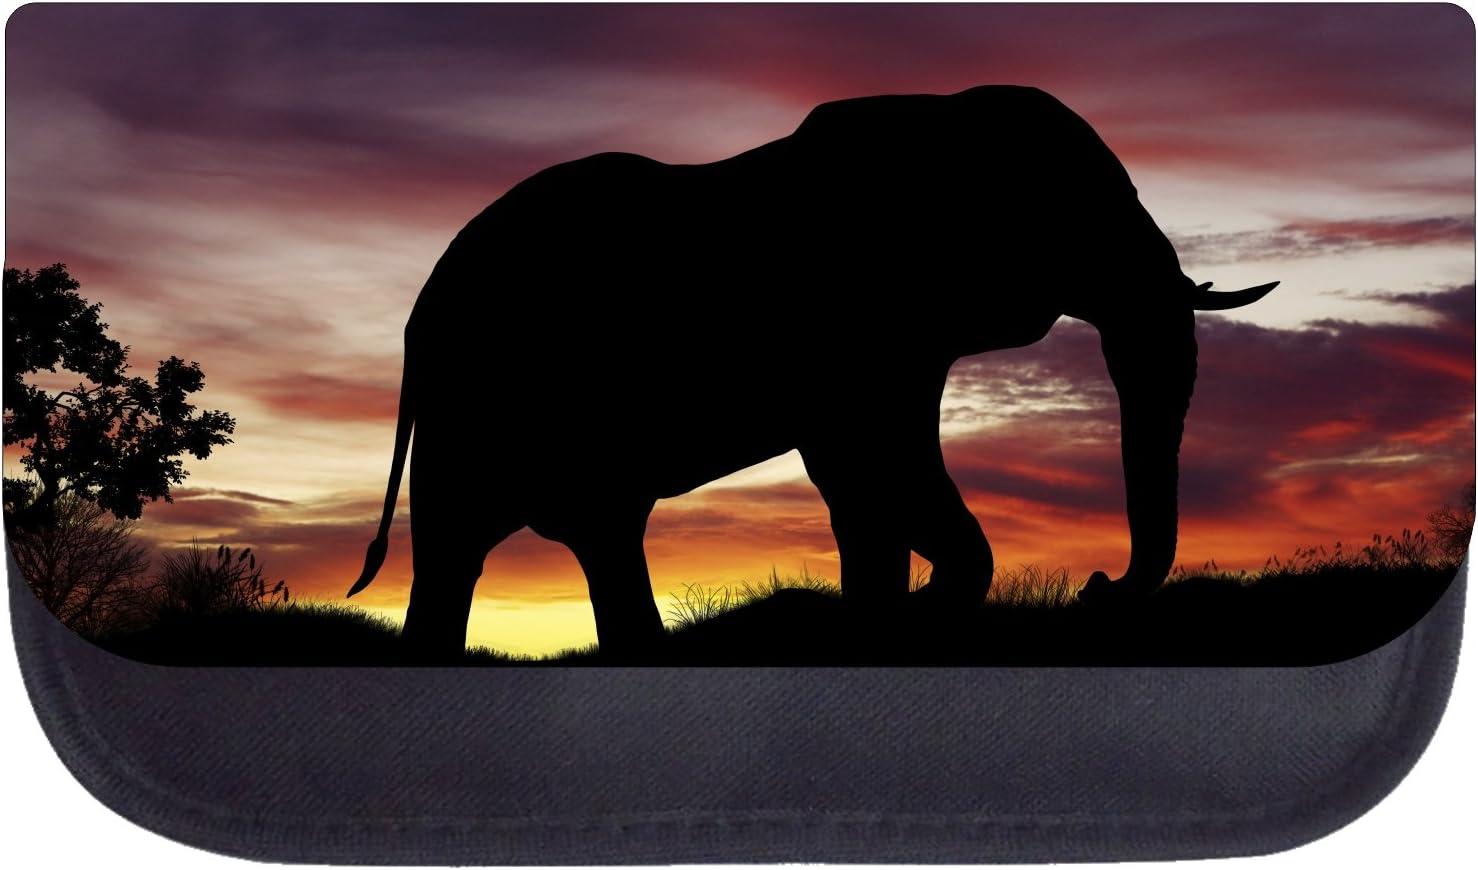 Elephant Sunset Silhouette Black School Backpack /& Pencil Bag Set